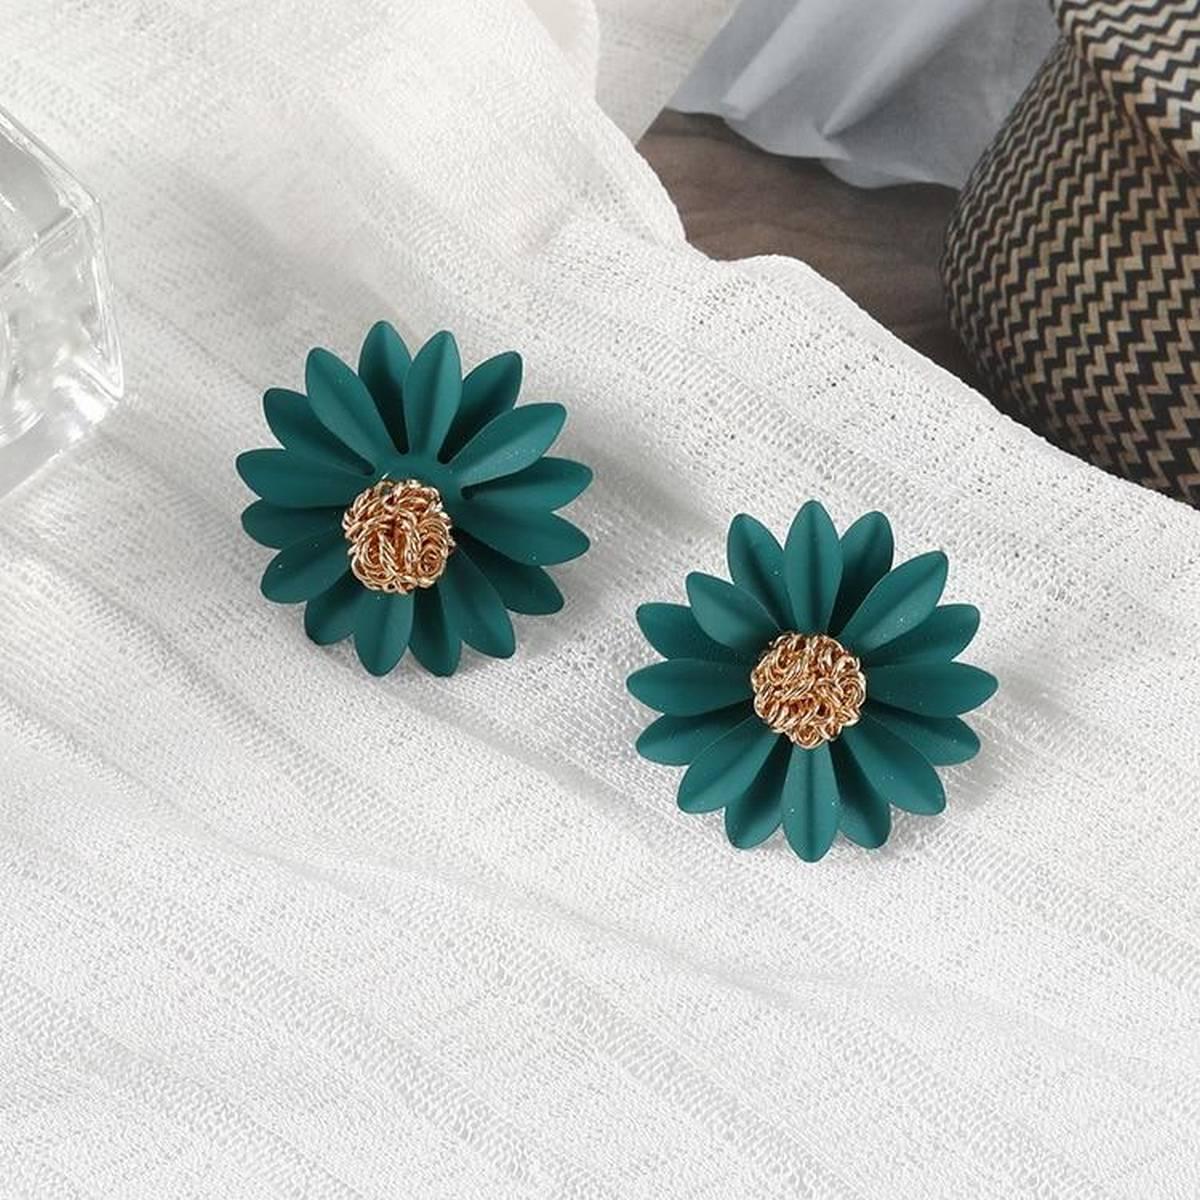 Trendy Cloth Sunflower Flower Stud Earrings Female Statement Earrings